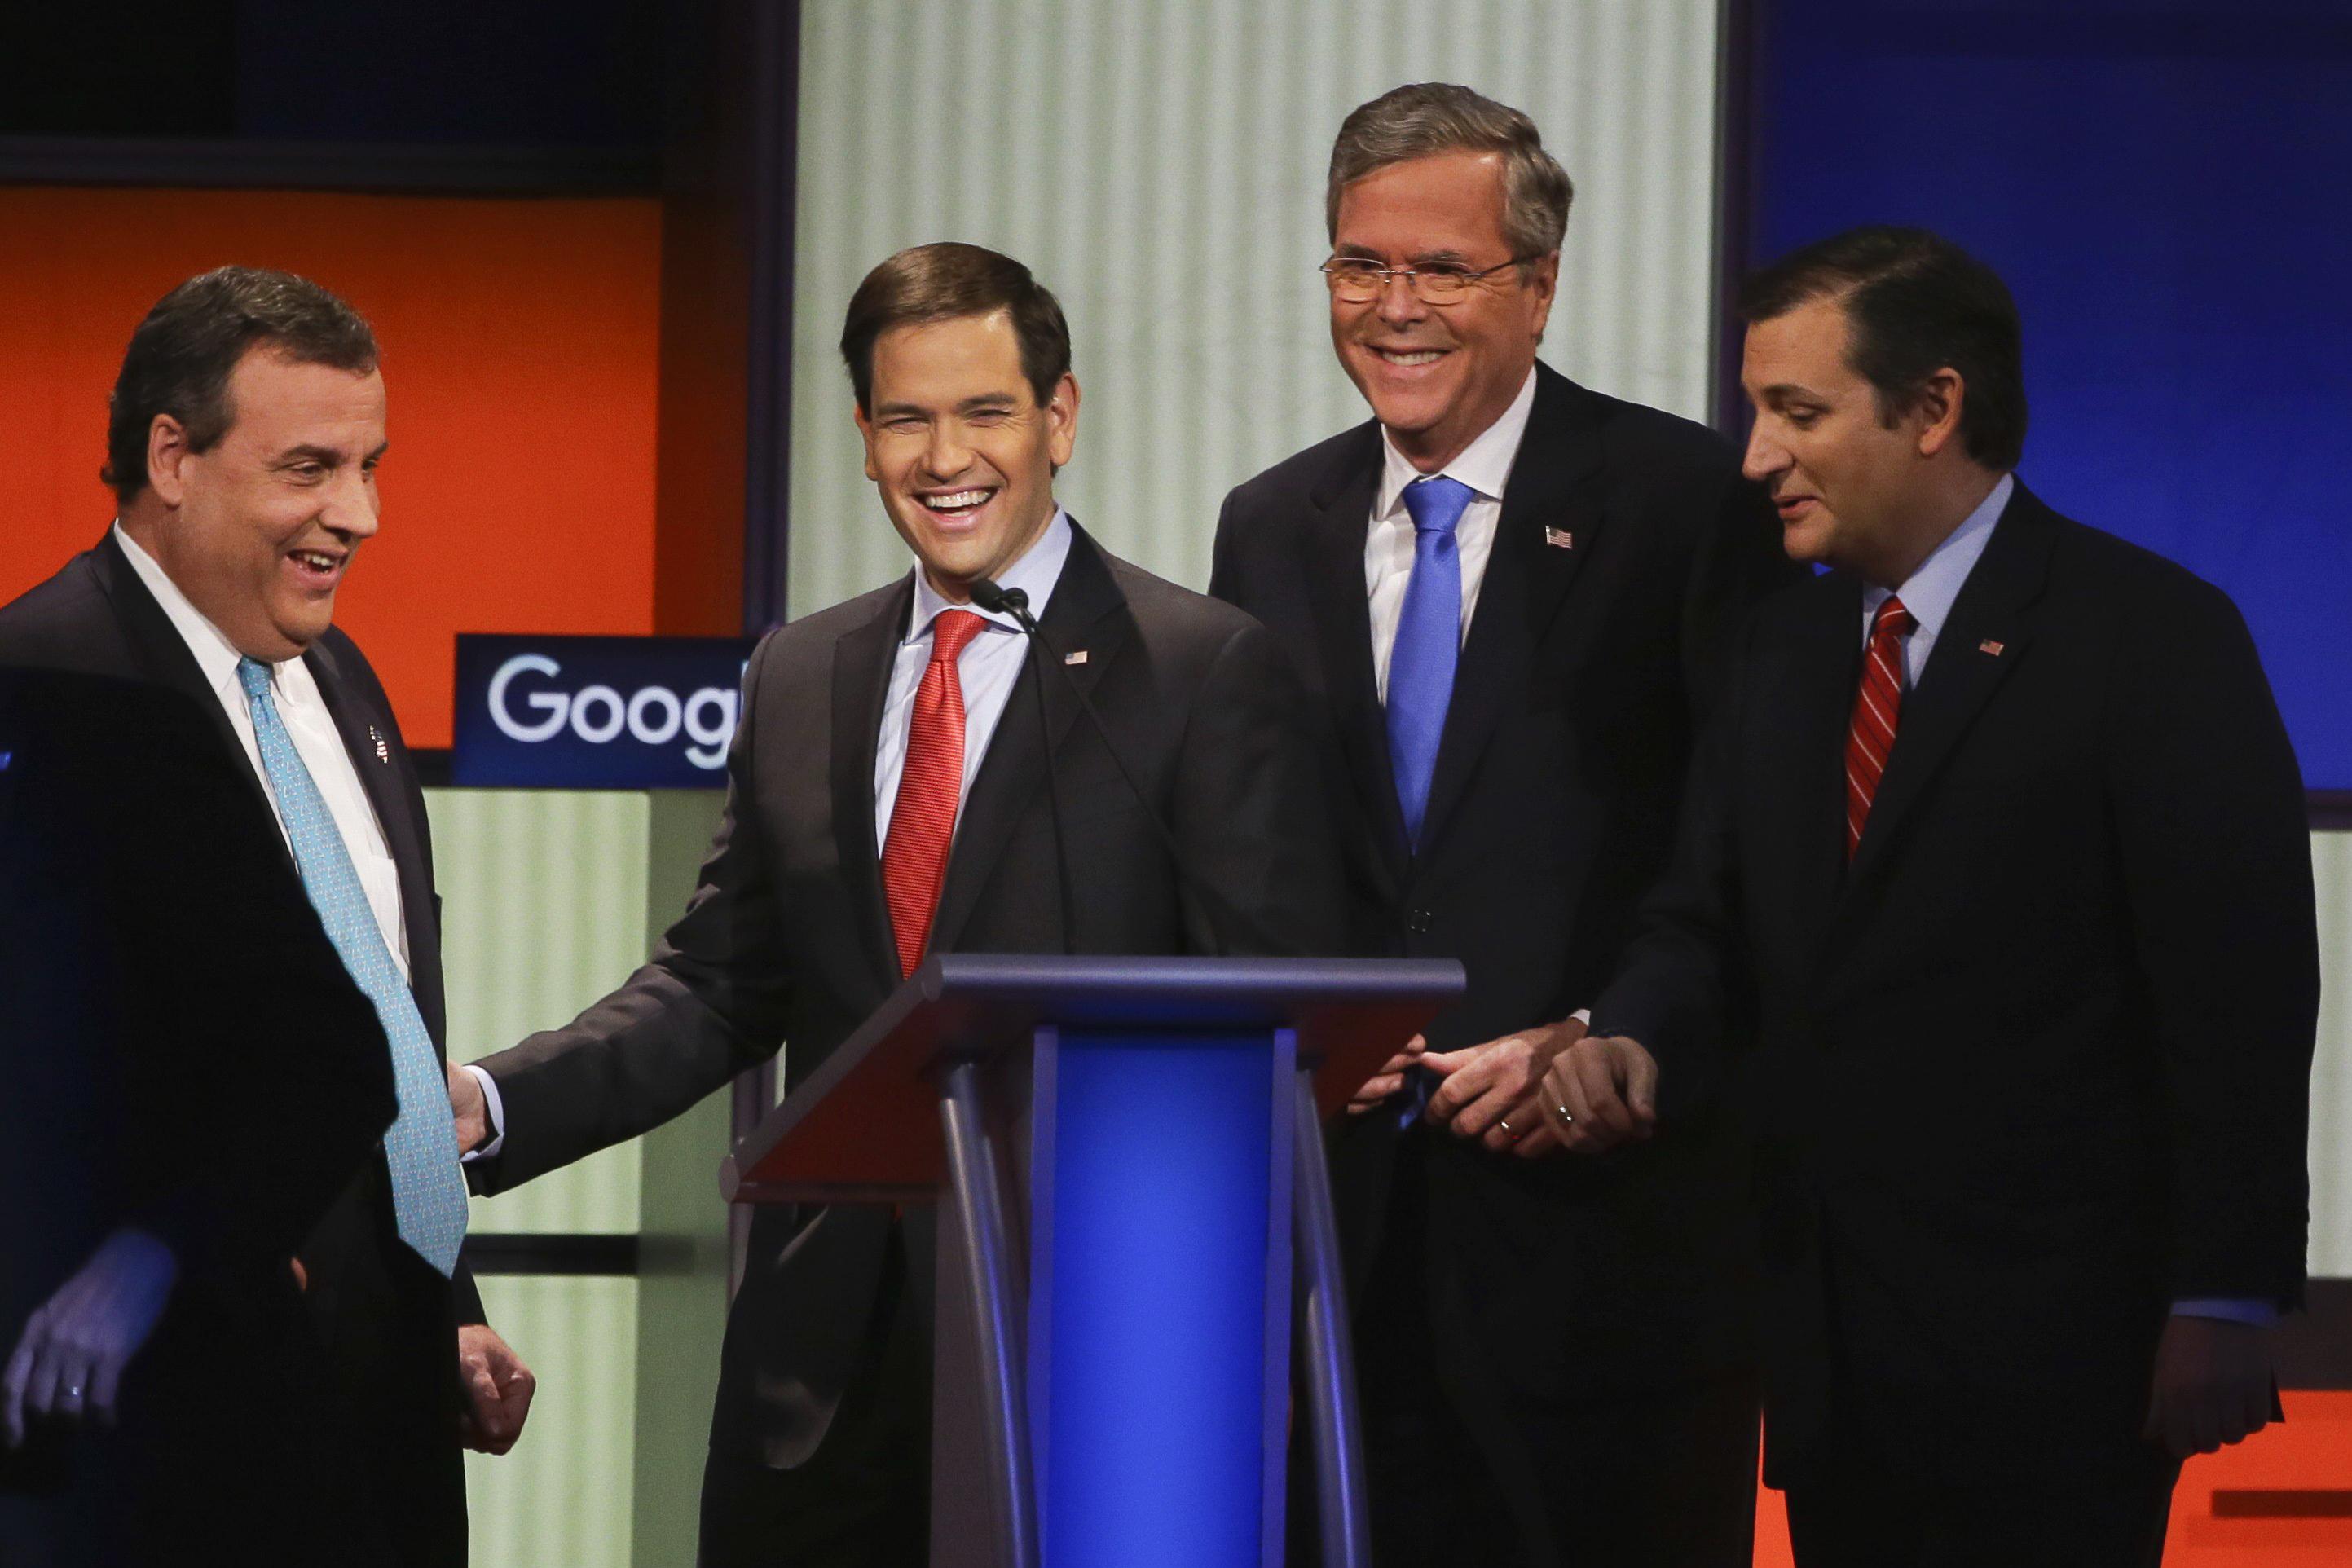 Republican presidential candidates, from left, New Jersey Gov. Chris Christie, Sen. Marco Rubio, R-Fla., former Florida Gov. Jeb Bush and Sen. Ted Cruz, R-Texas, talk after the Republican presidential primary debate, Thursday, Jan. 28, 2016, in Des Moines, Iowa.